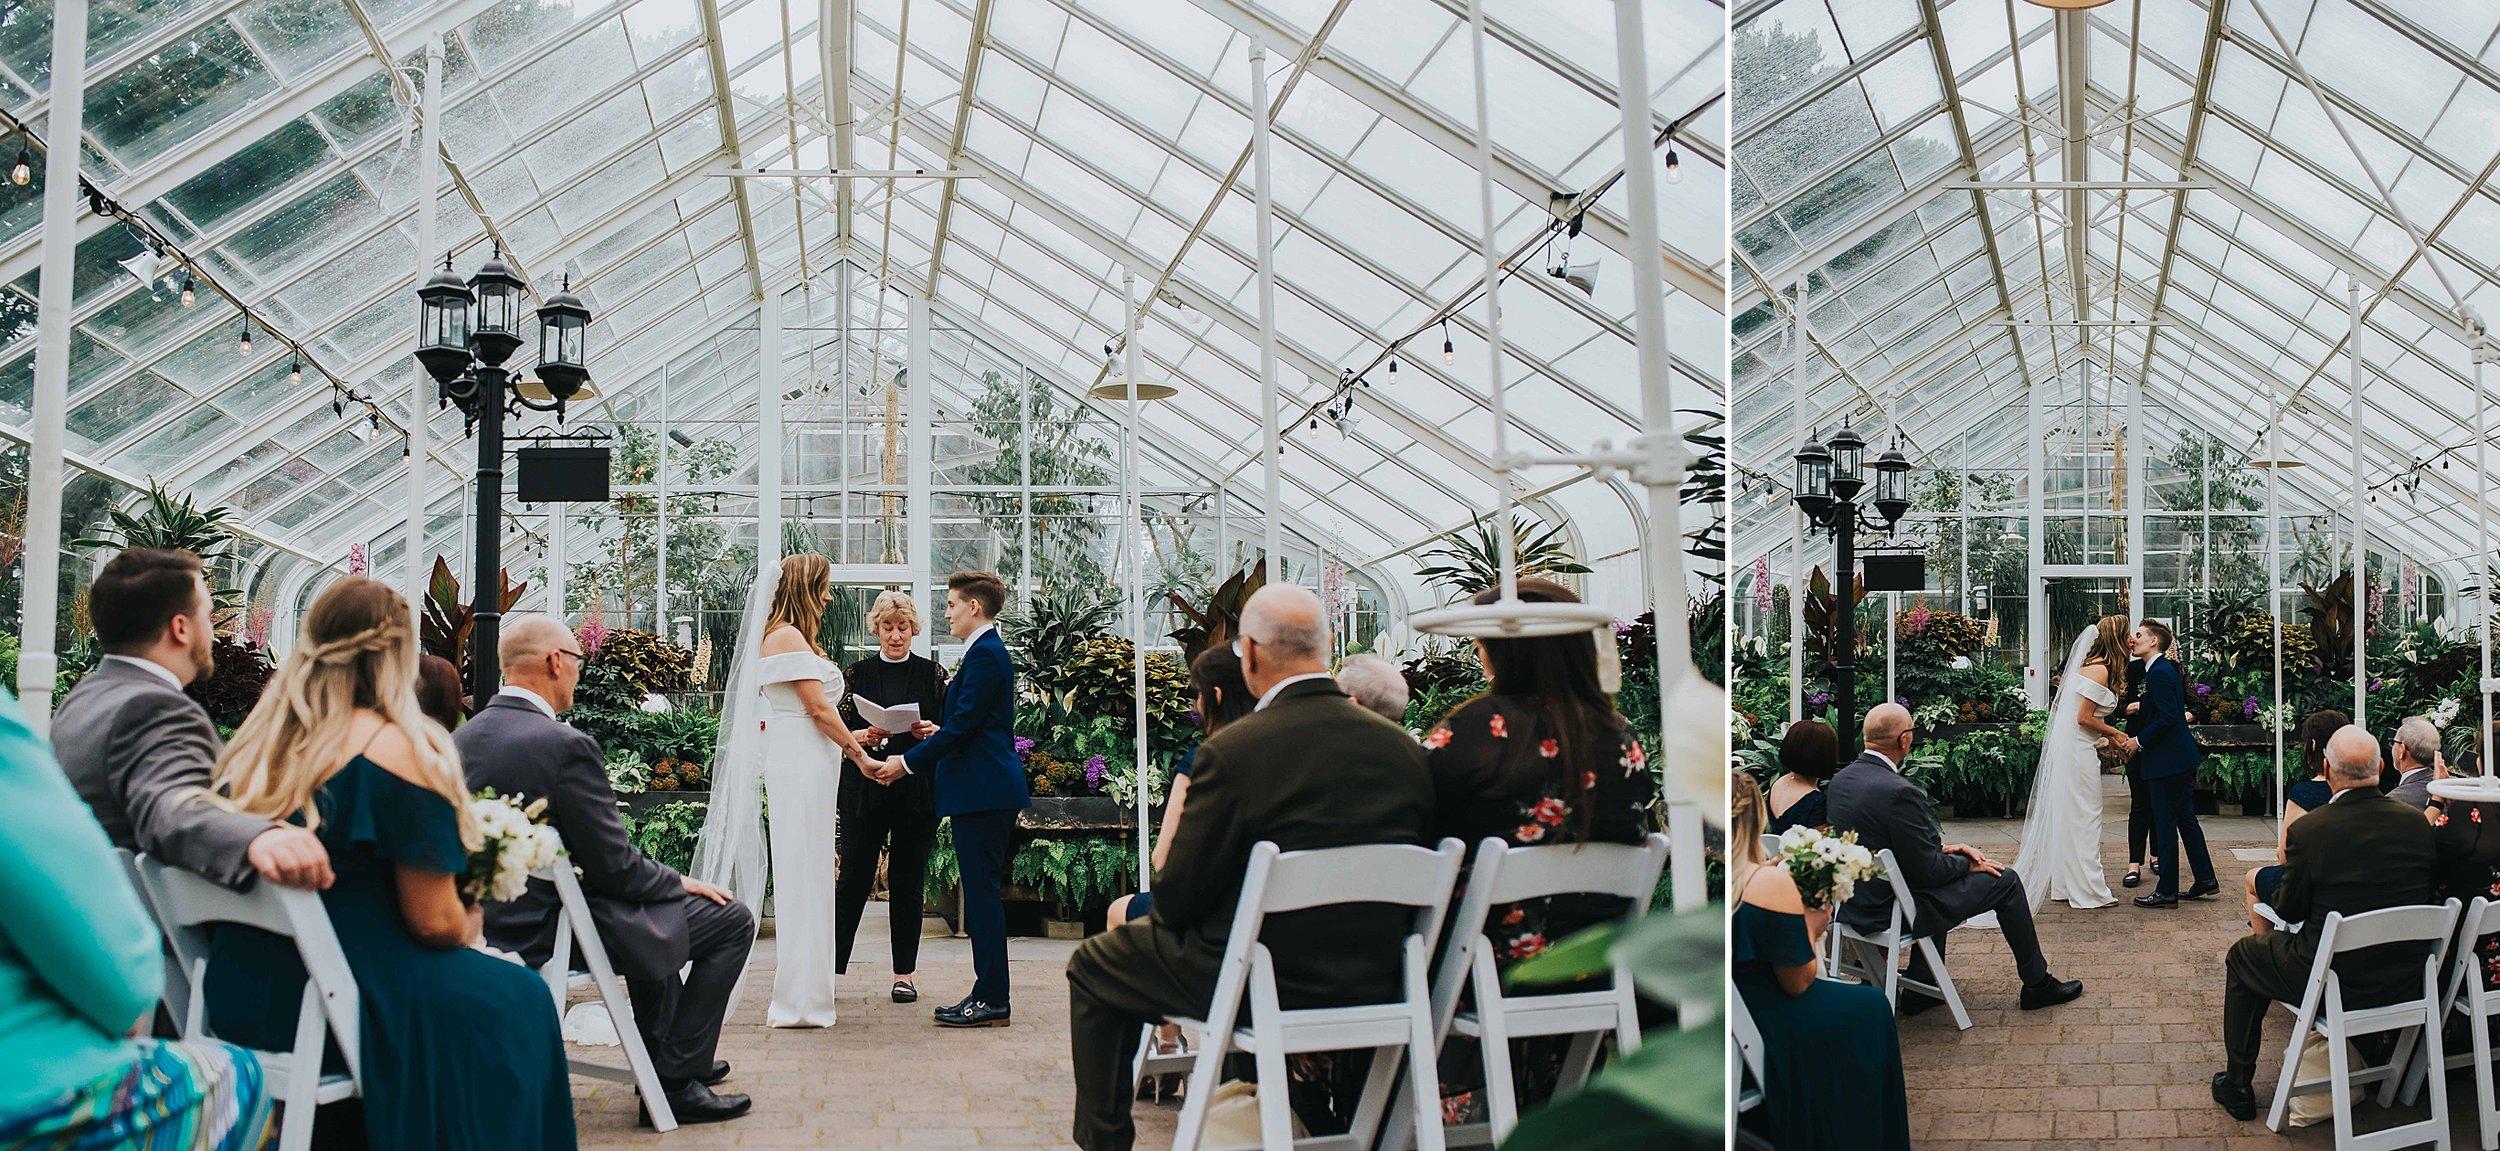 Seattle-Wedding-photographer-J HODGES PHOTOGRAPHY_0324.jpg